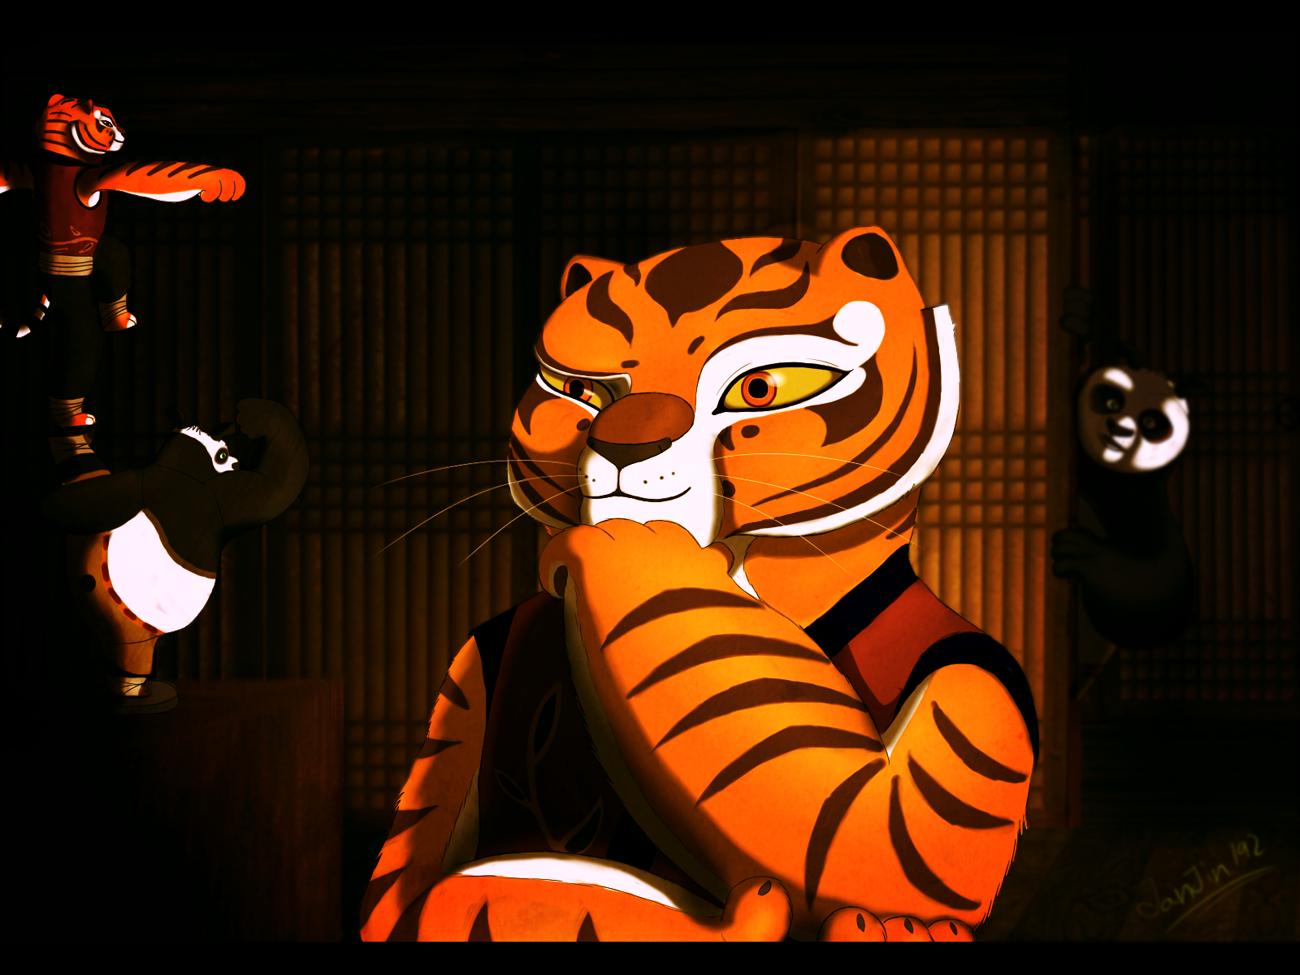 Kung Fu Panda Pin-Up 2 by Jackademus on DeviantArt